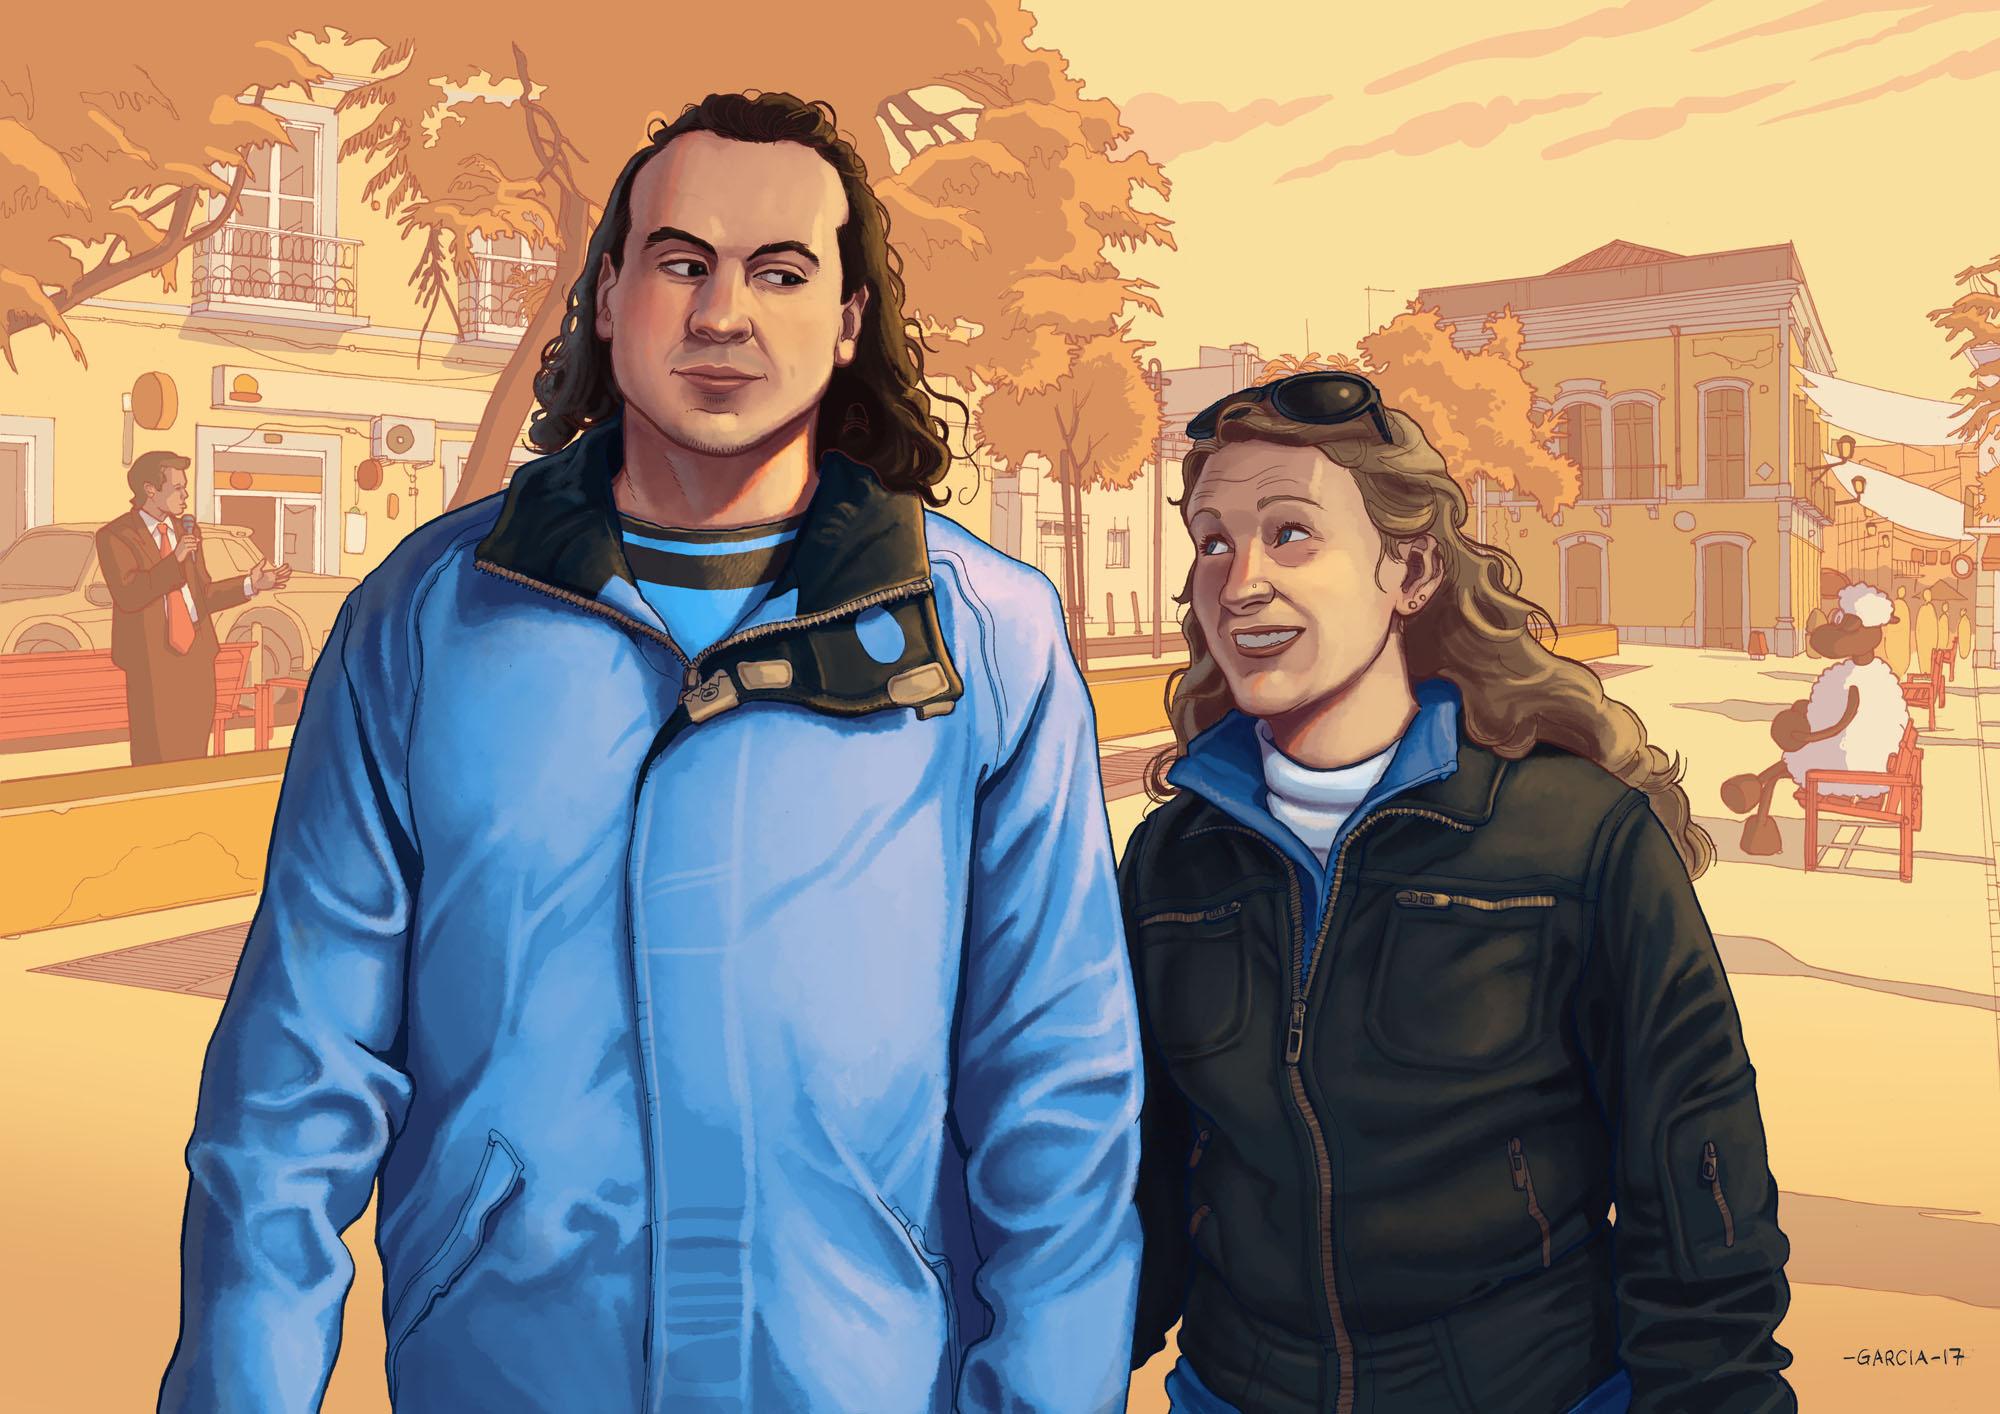 Daniel Garcia Art Illustration The Water Drinkers Couple Man Woman Boy Girl Portrait Commission Caricature 01